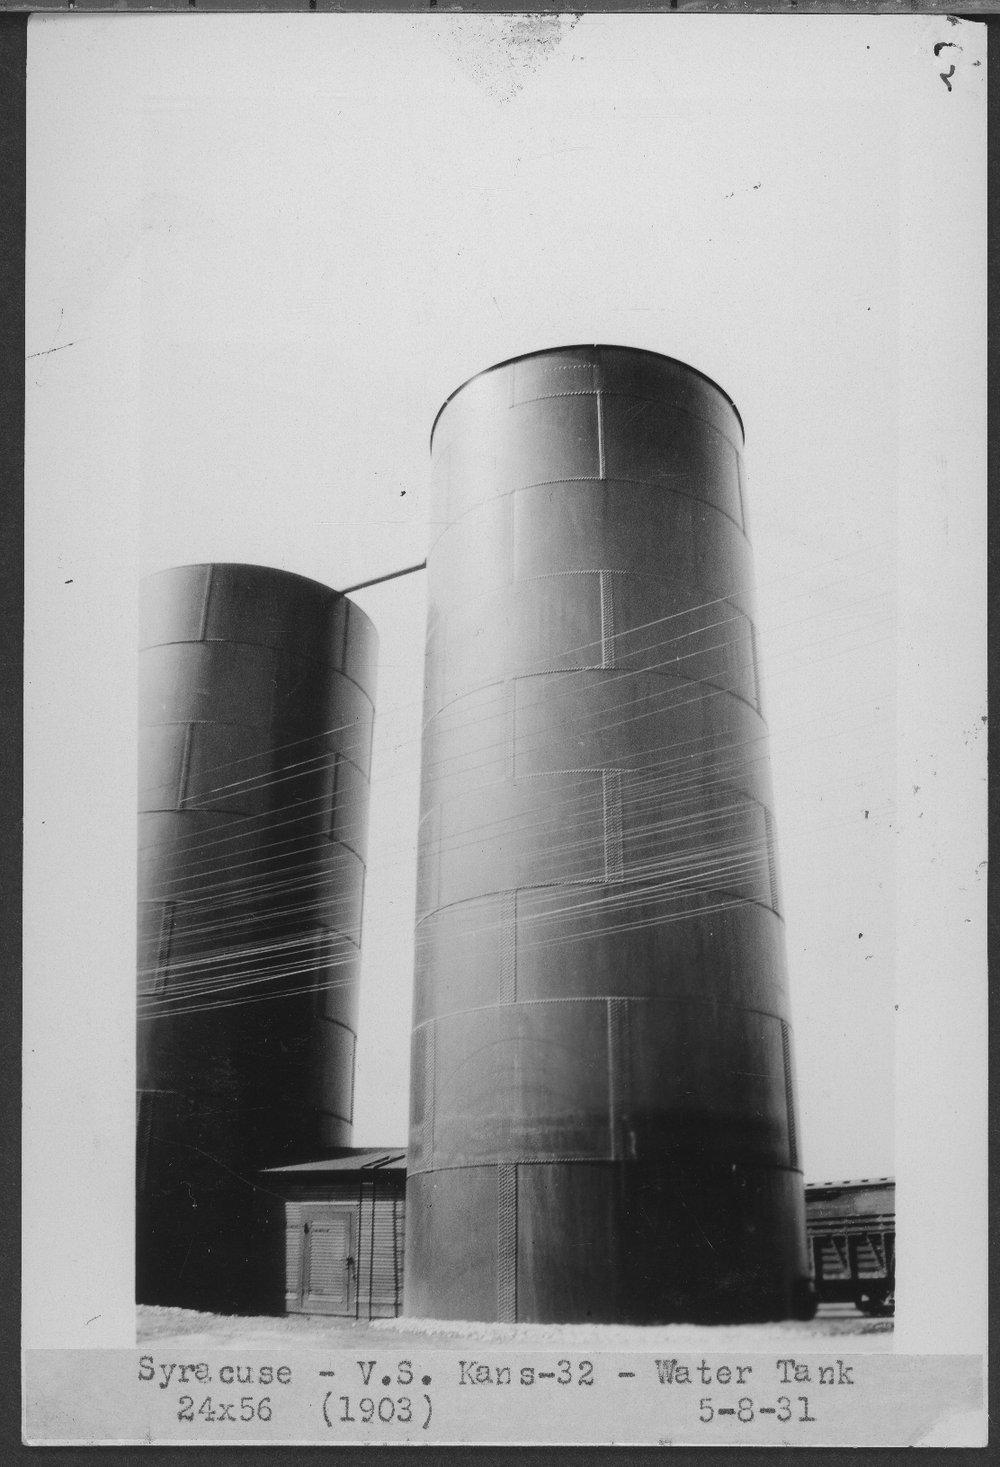 Atchison, Topeka & Santa Fe Railway Company water tank, Syracuse, Kansas